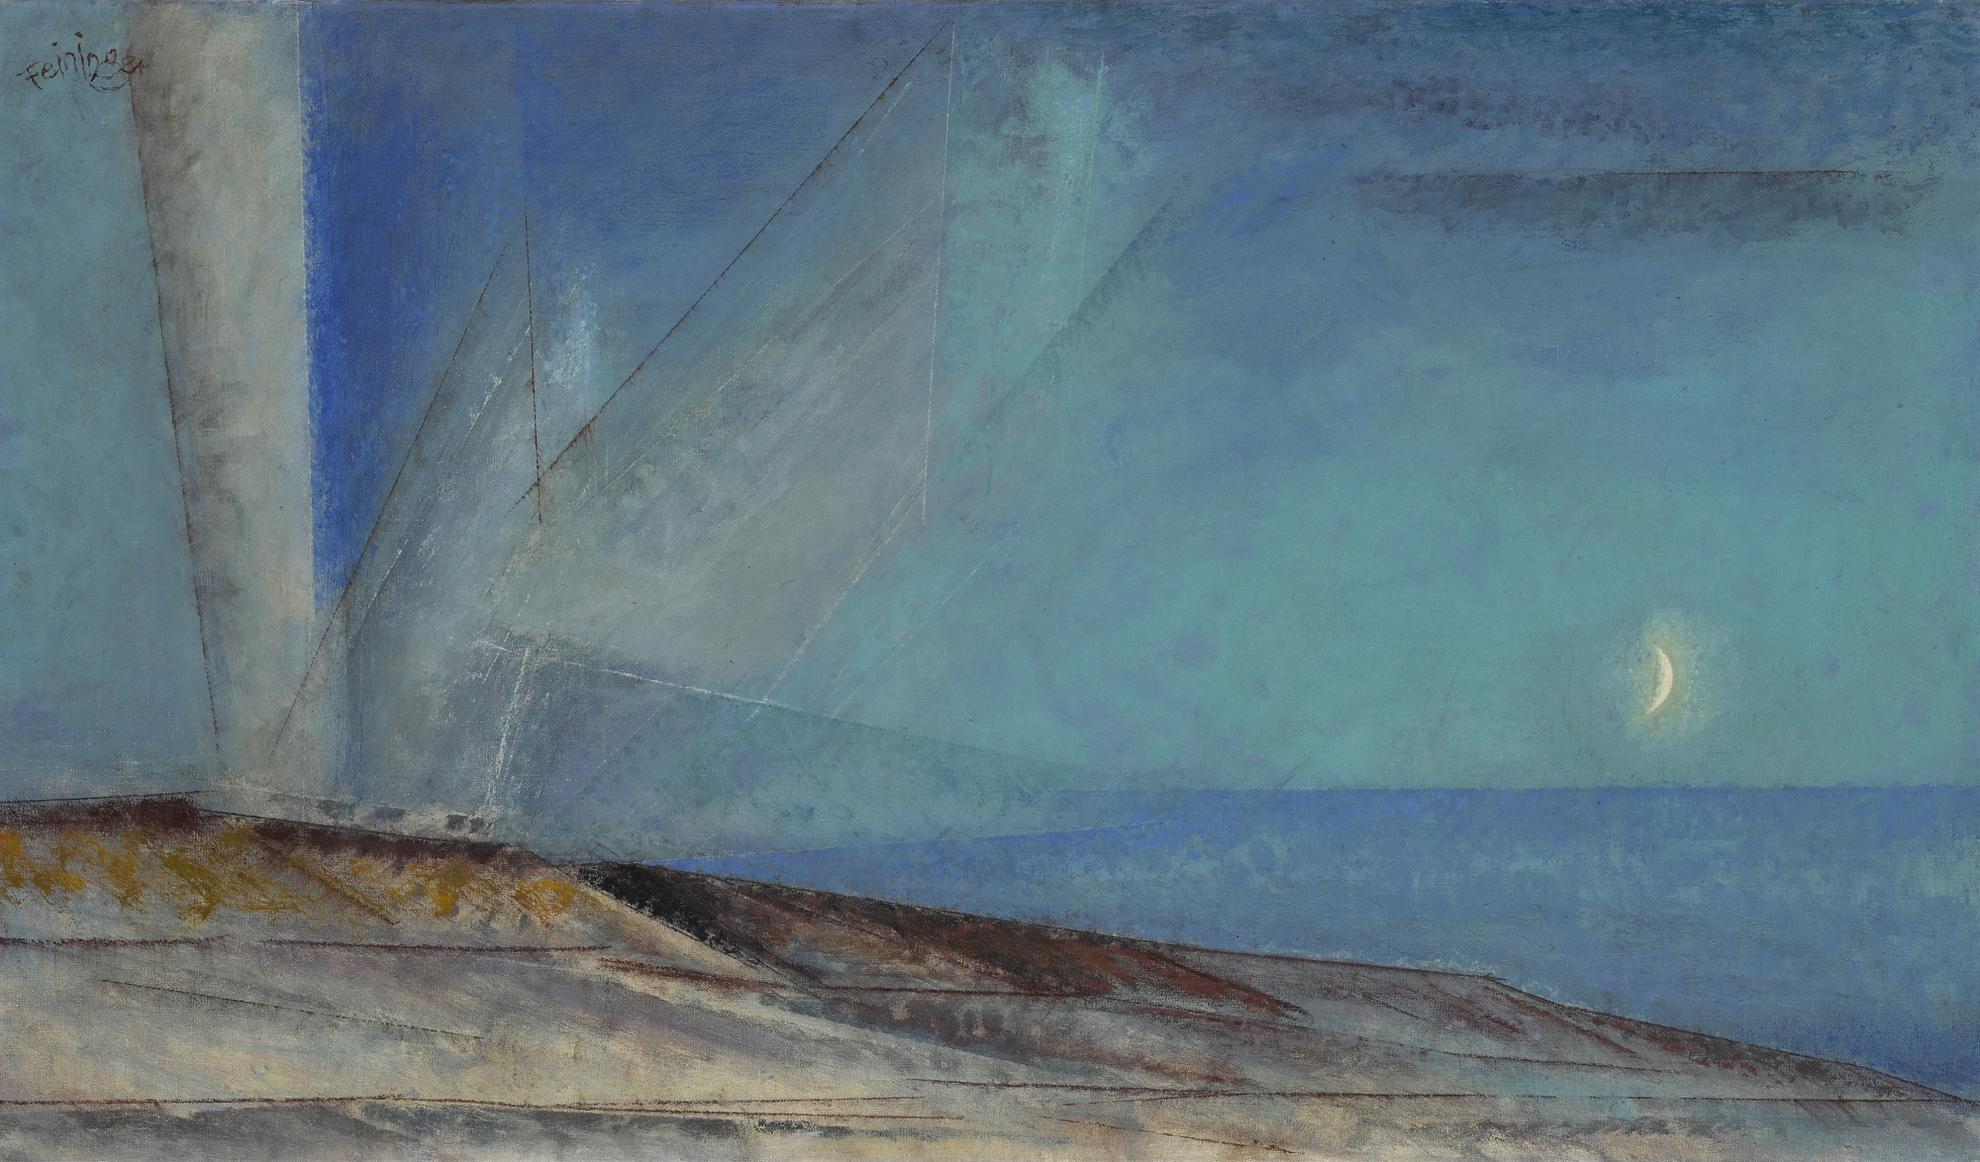 Lyonel Feininger-Dunes, Hazy Evening-1944